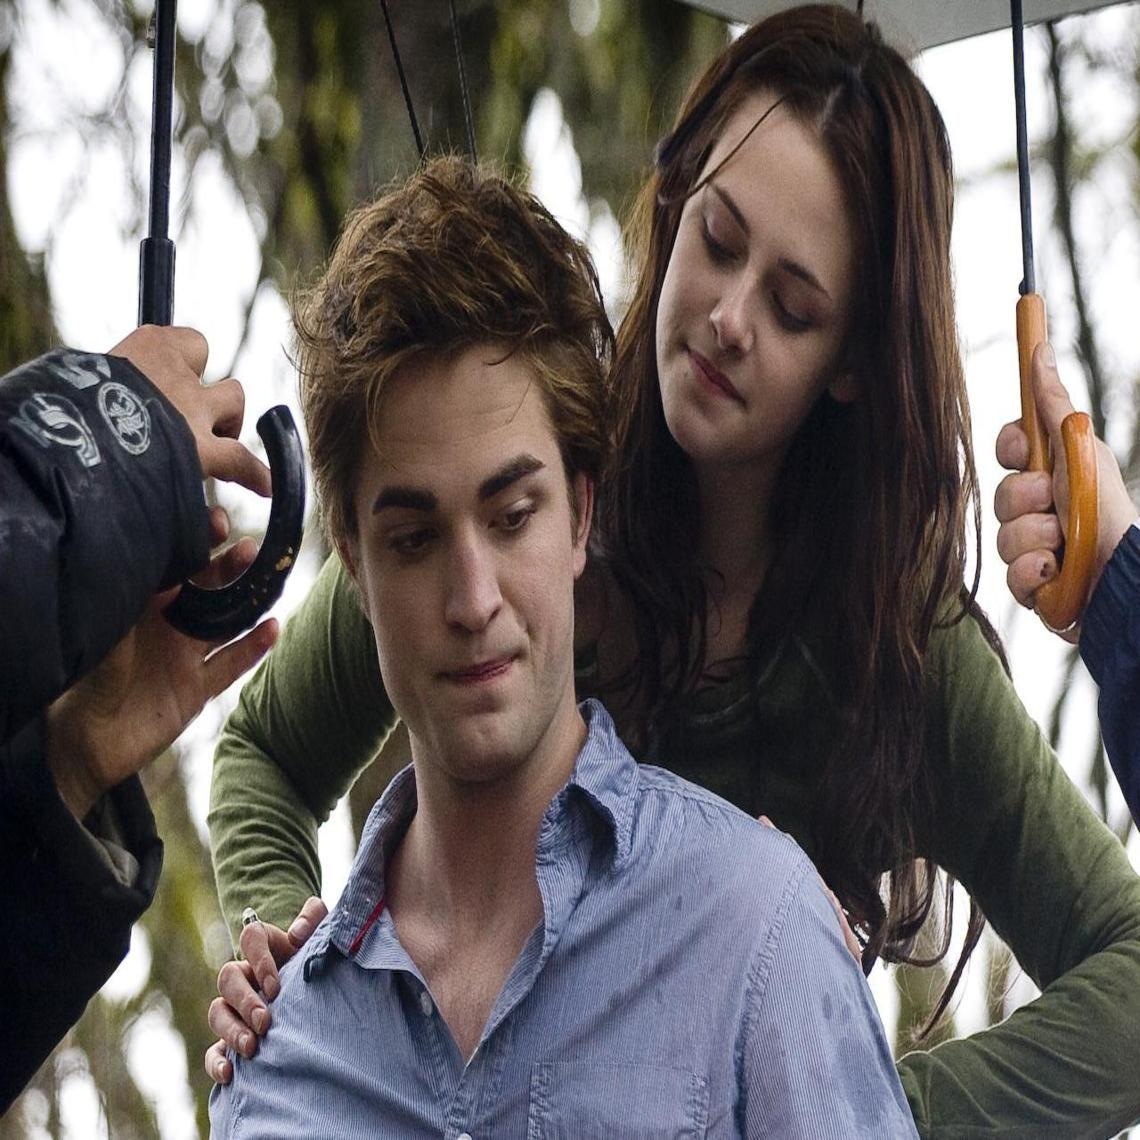 Edward and Bella on set